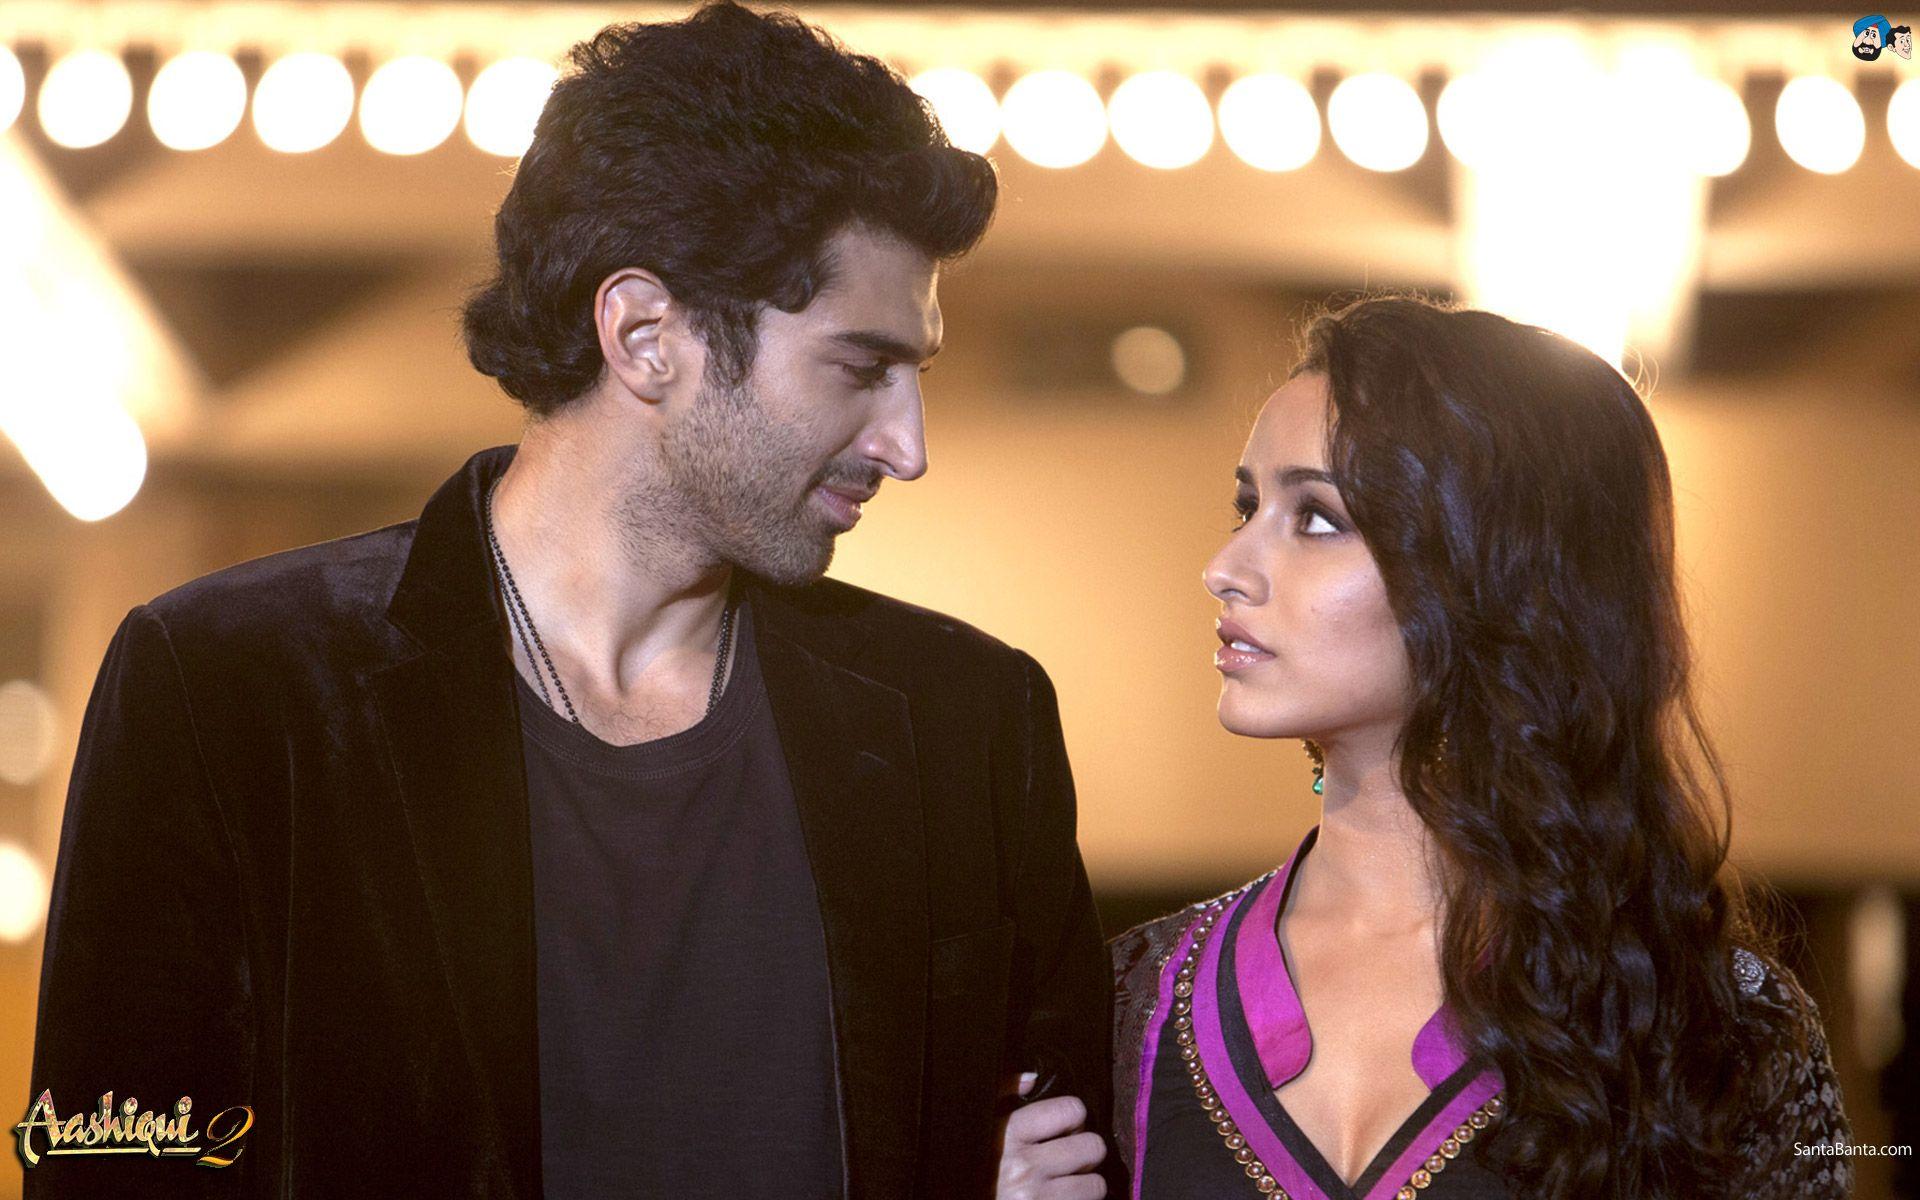 Aashiqui 2 Paar Dating Mittagessen datiert Website